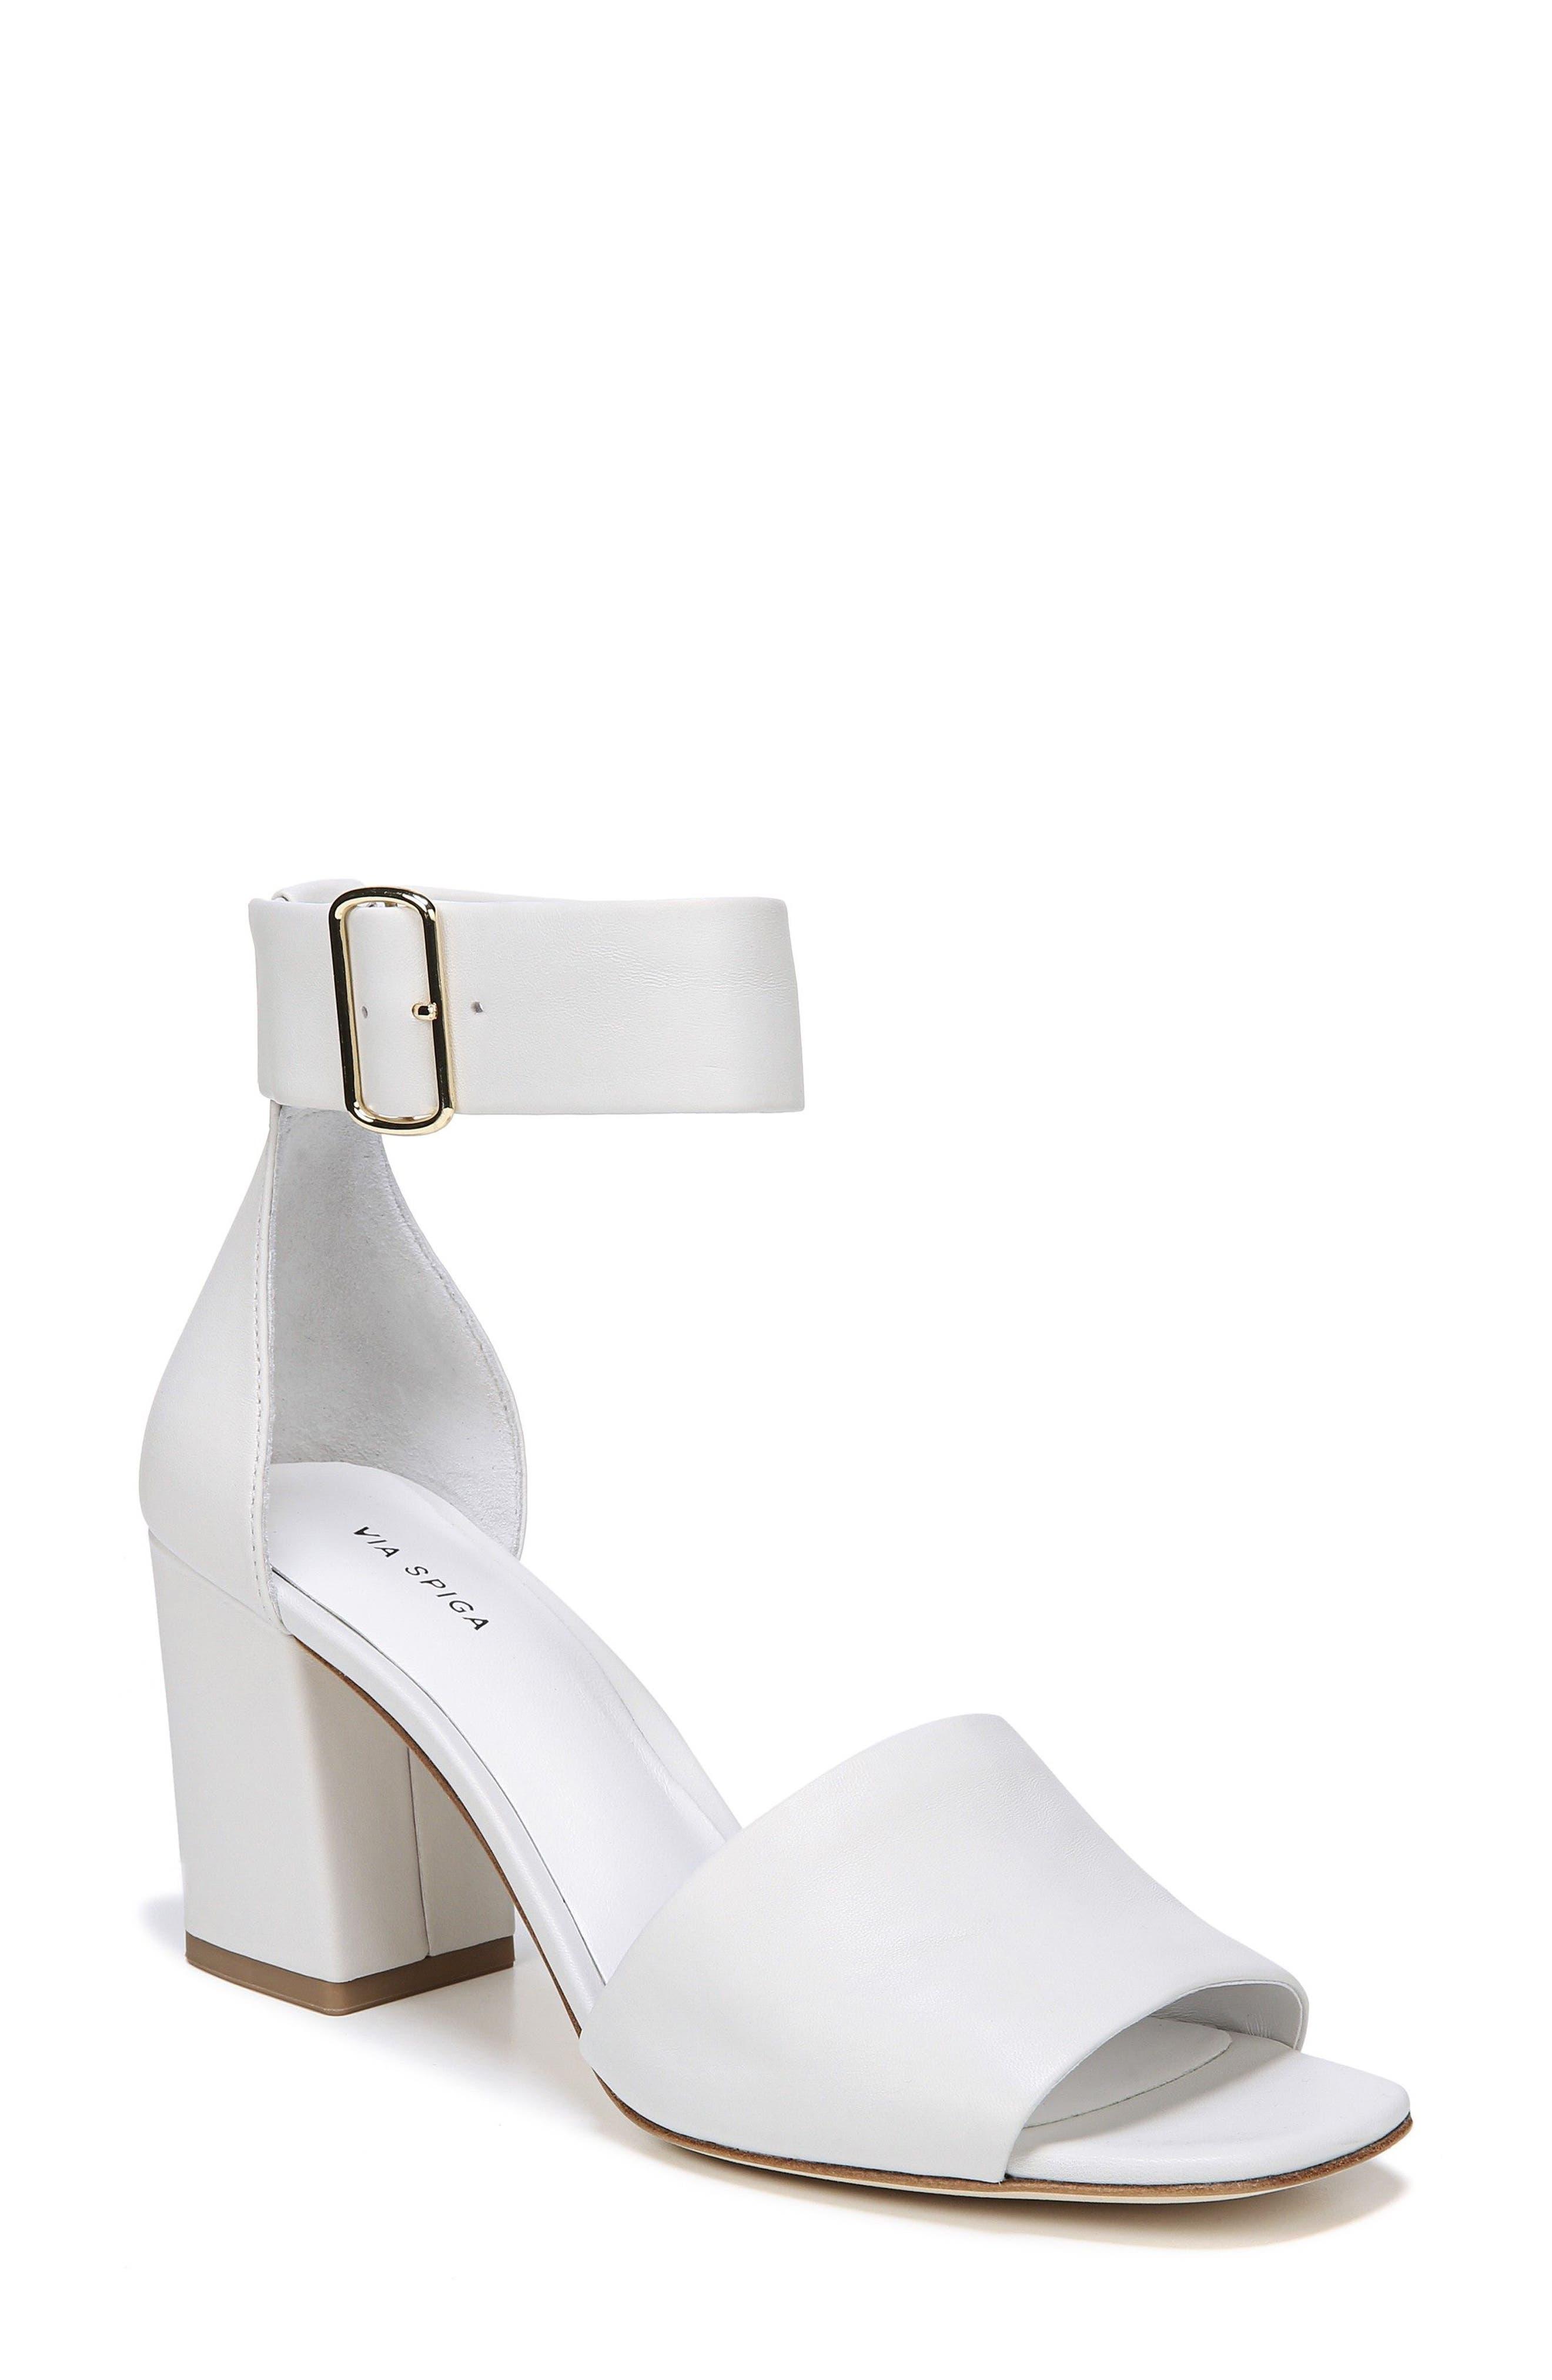 Evonne Ankle Strap Sandal,                         Main,                         color, Porcelain Leather